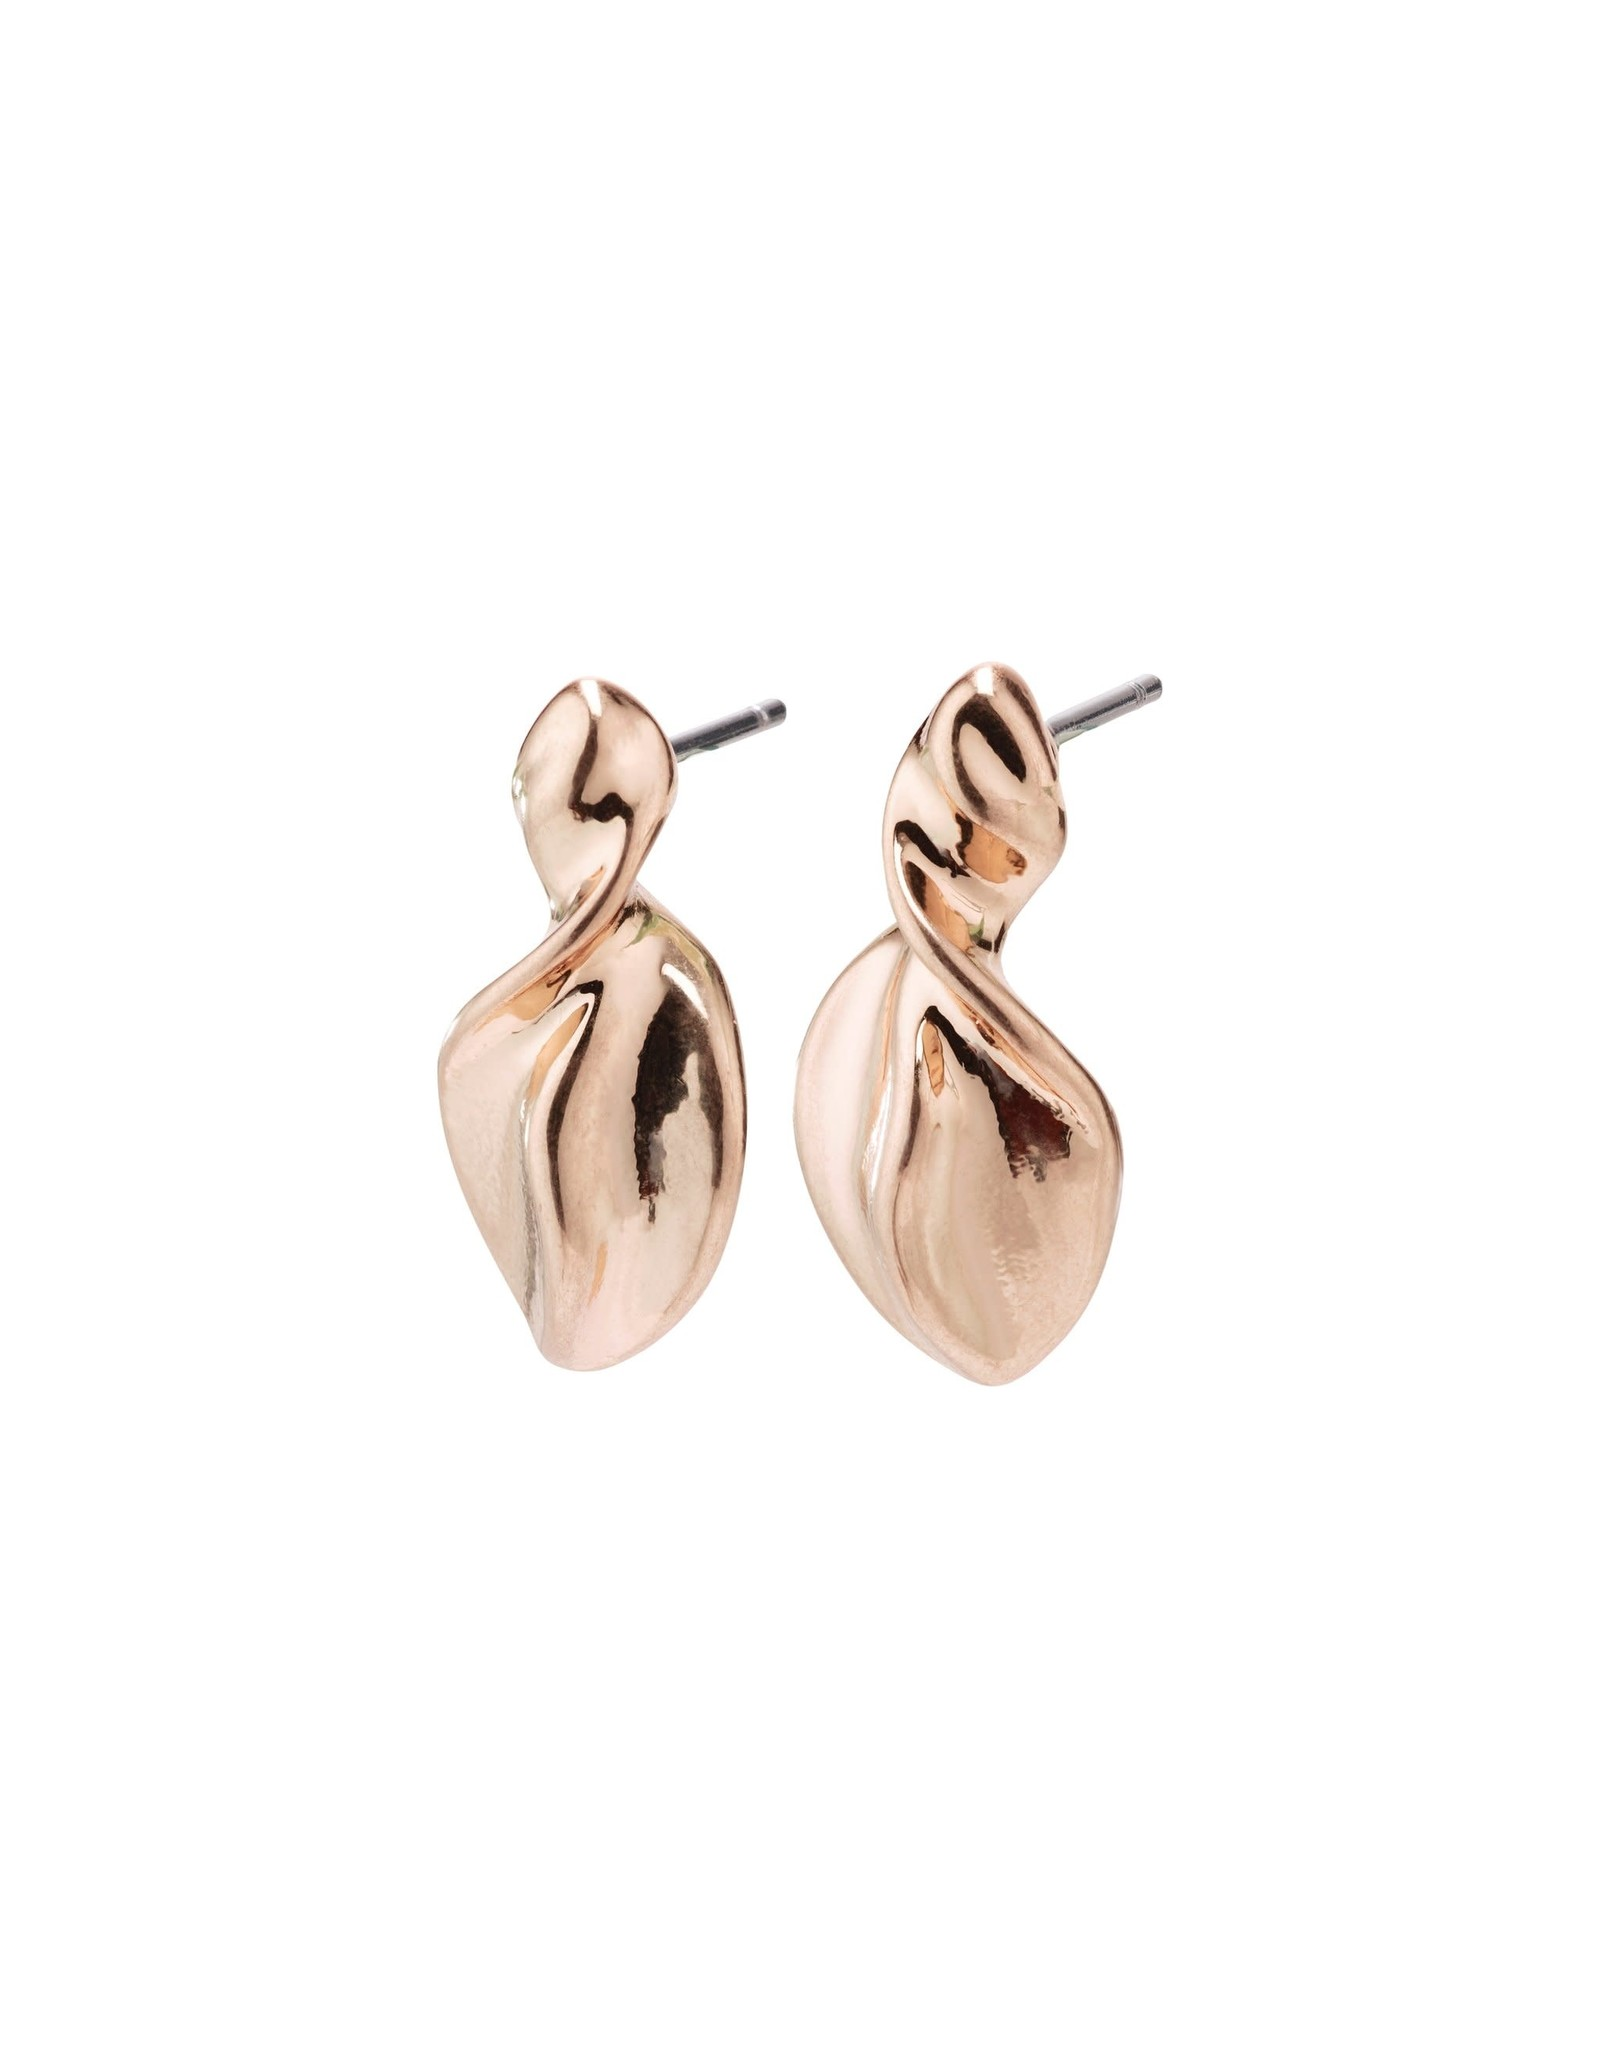 Pilgrim Pilgrim Hollis Earrings Rose Gold Plated